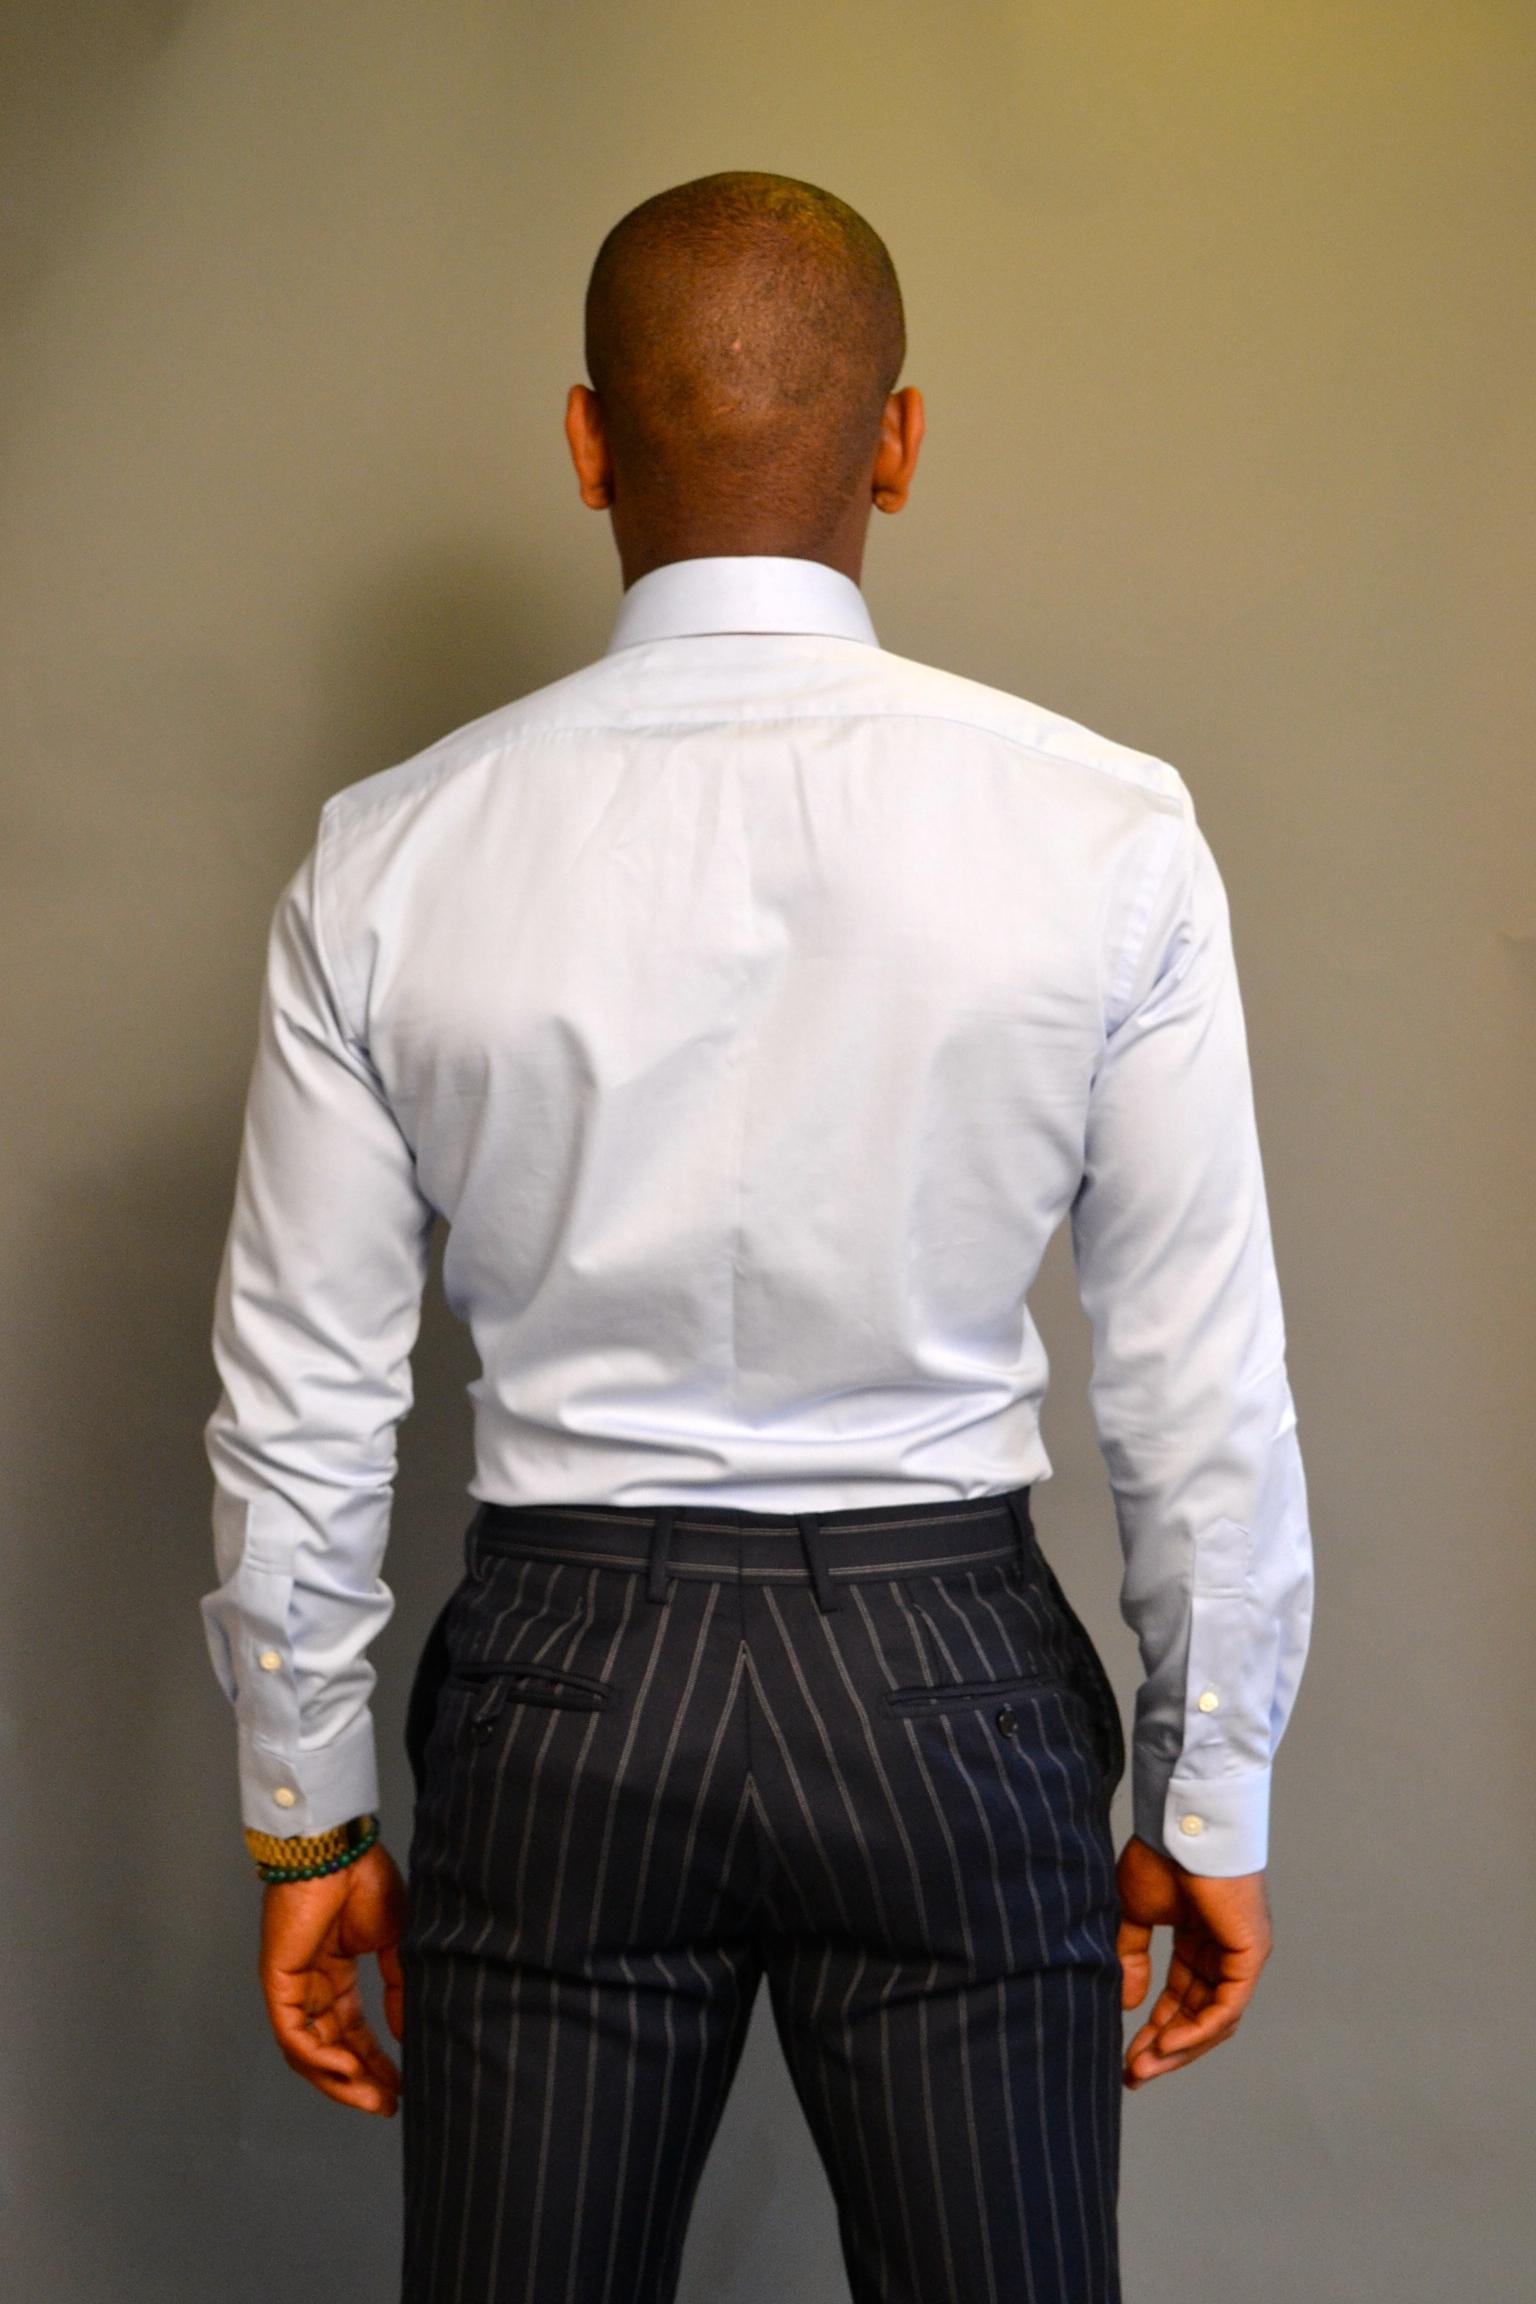 Sabir Peele in Shirt Cycle